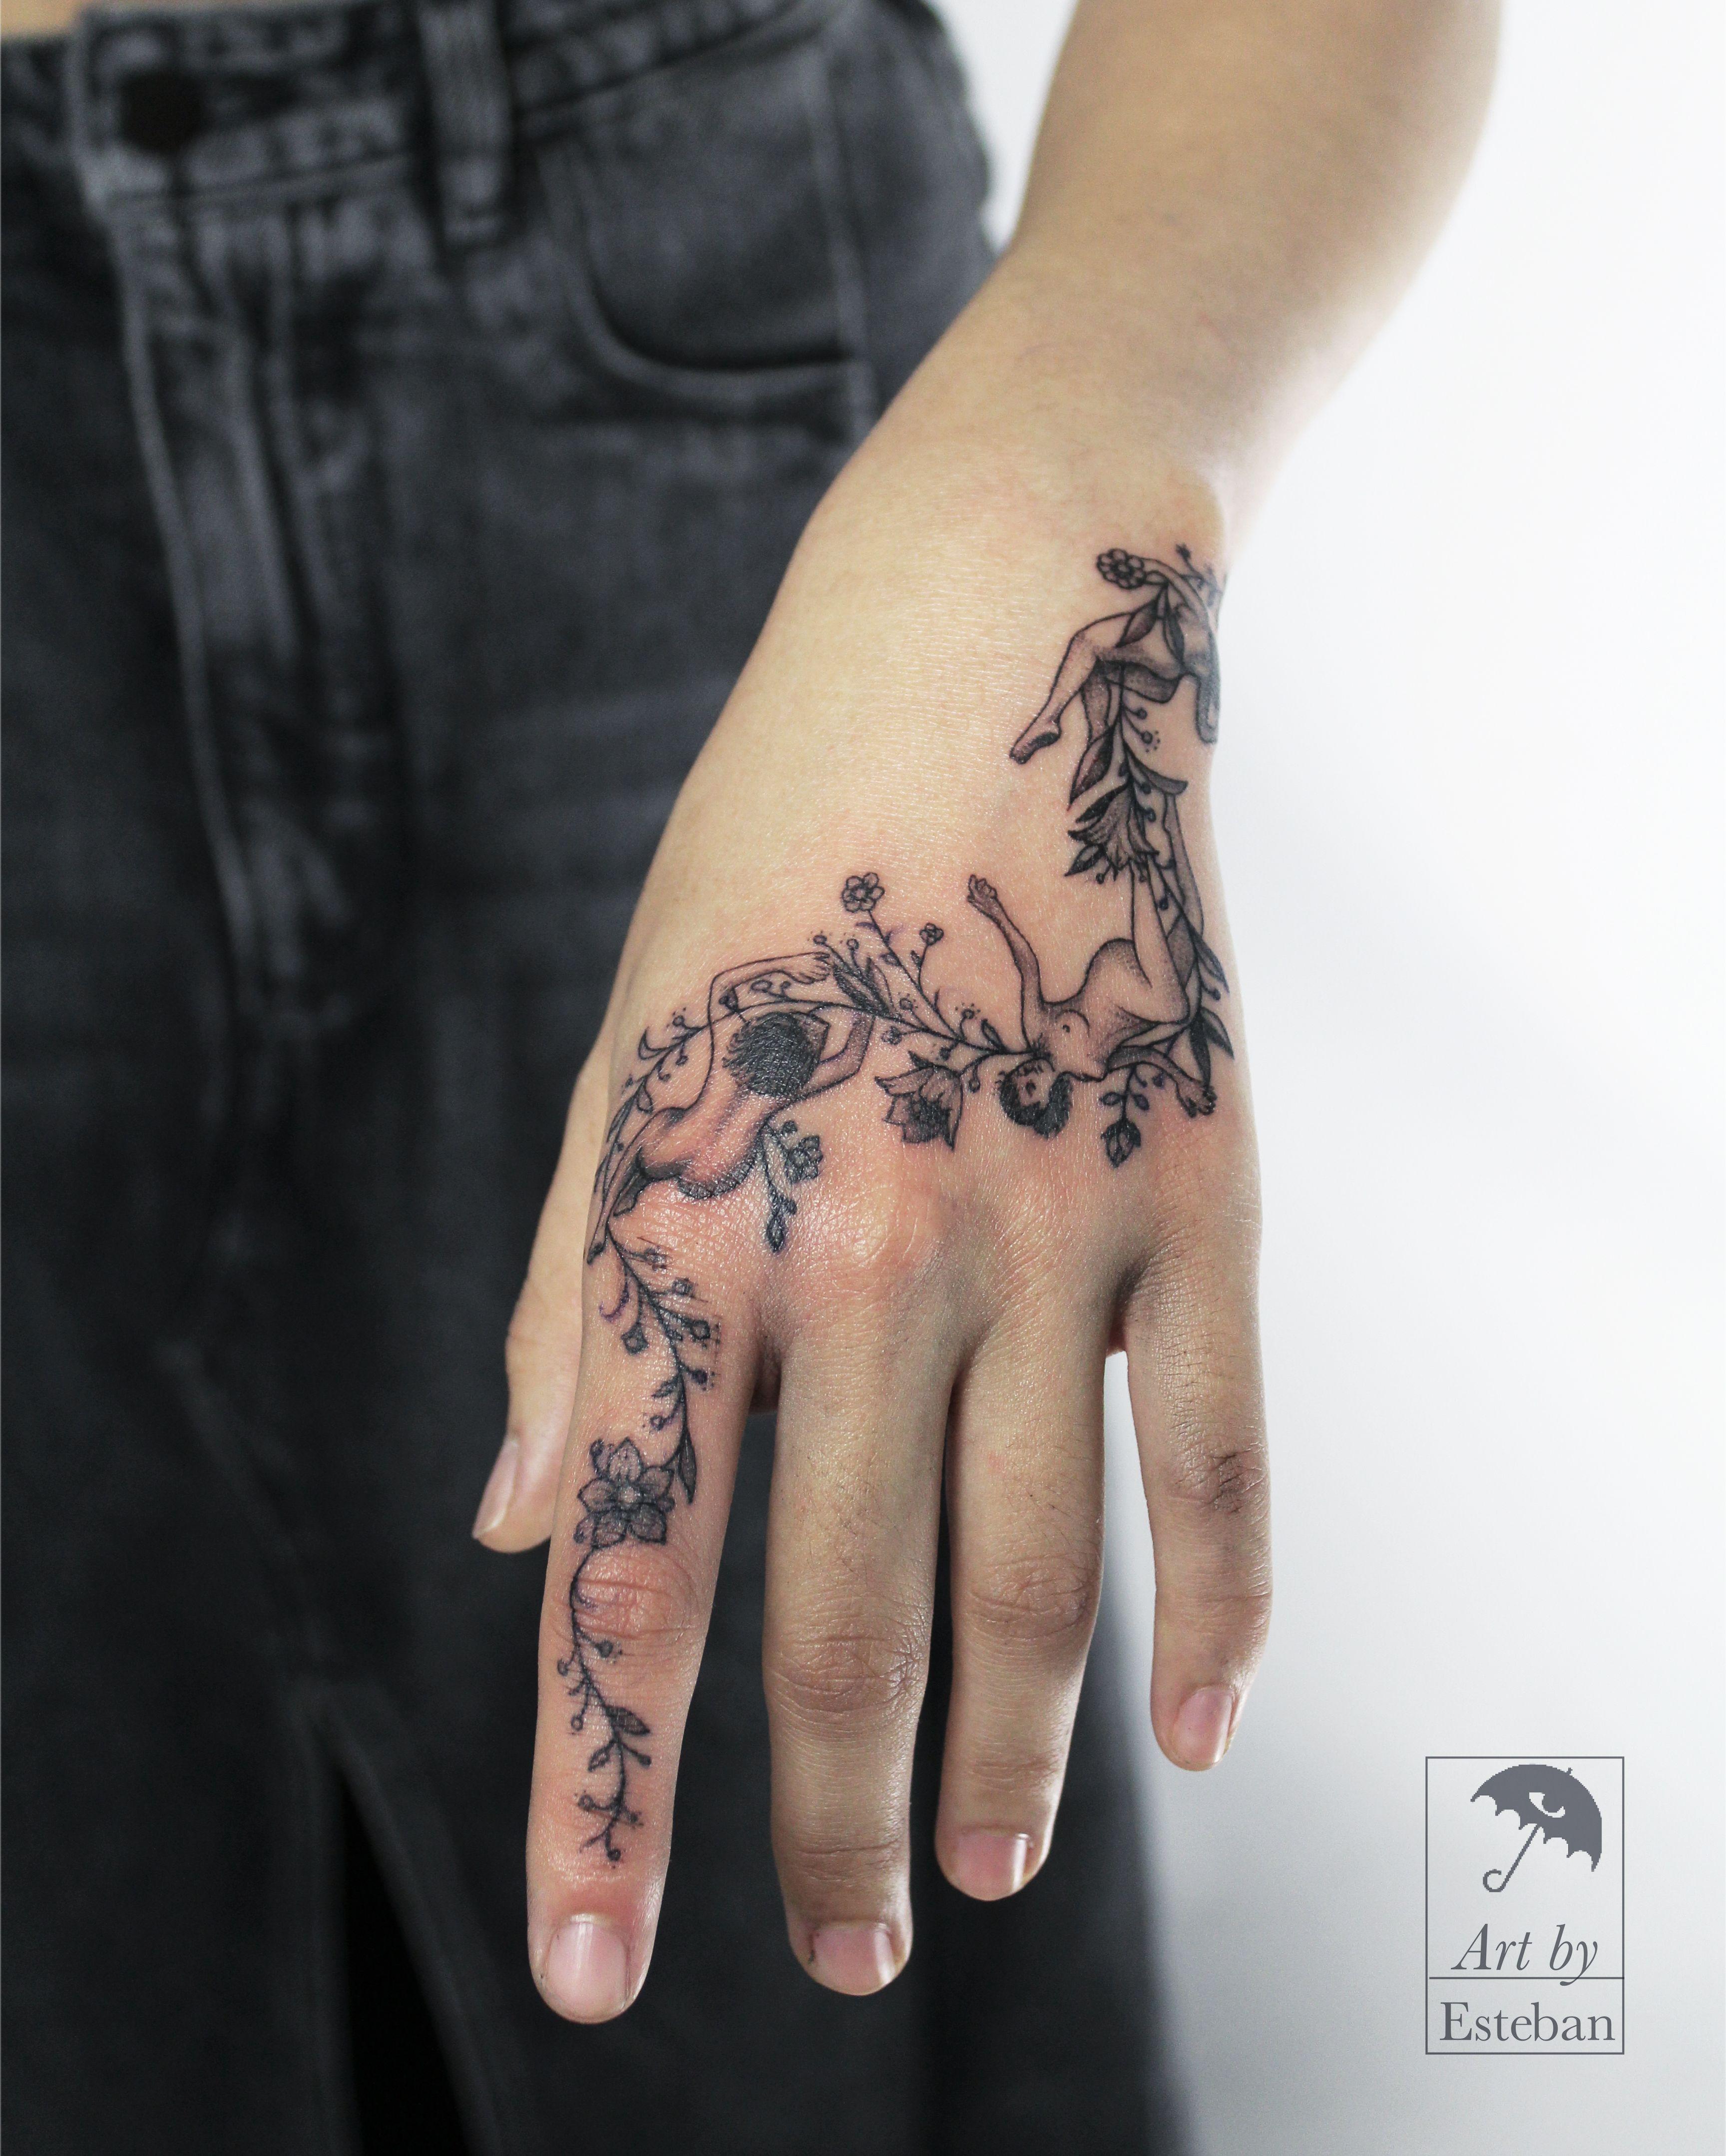 Black Black Tattoo Blackwork Blackwork Tattoo Black Work Black Work Tattoo Feminine Feminine Tattoo Hand Blackwork Tattoo Finger Tattoos Hand Tattoos